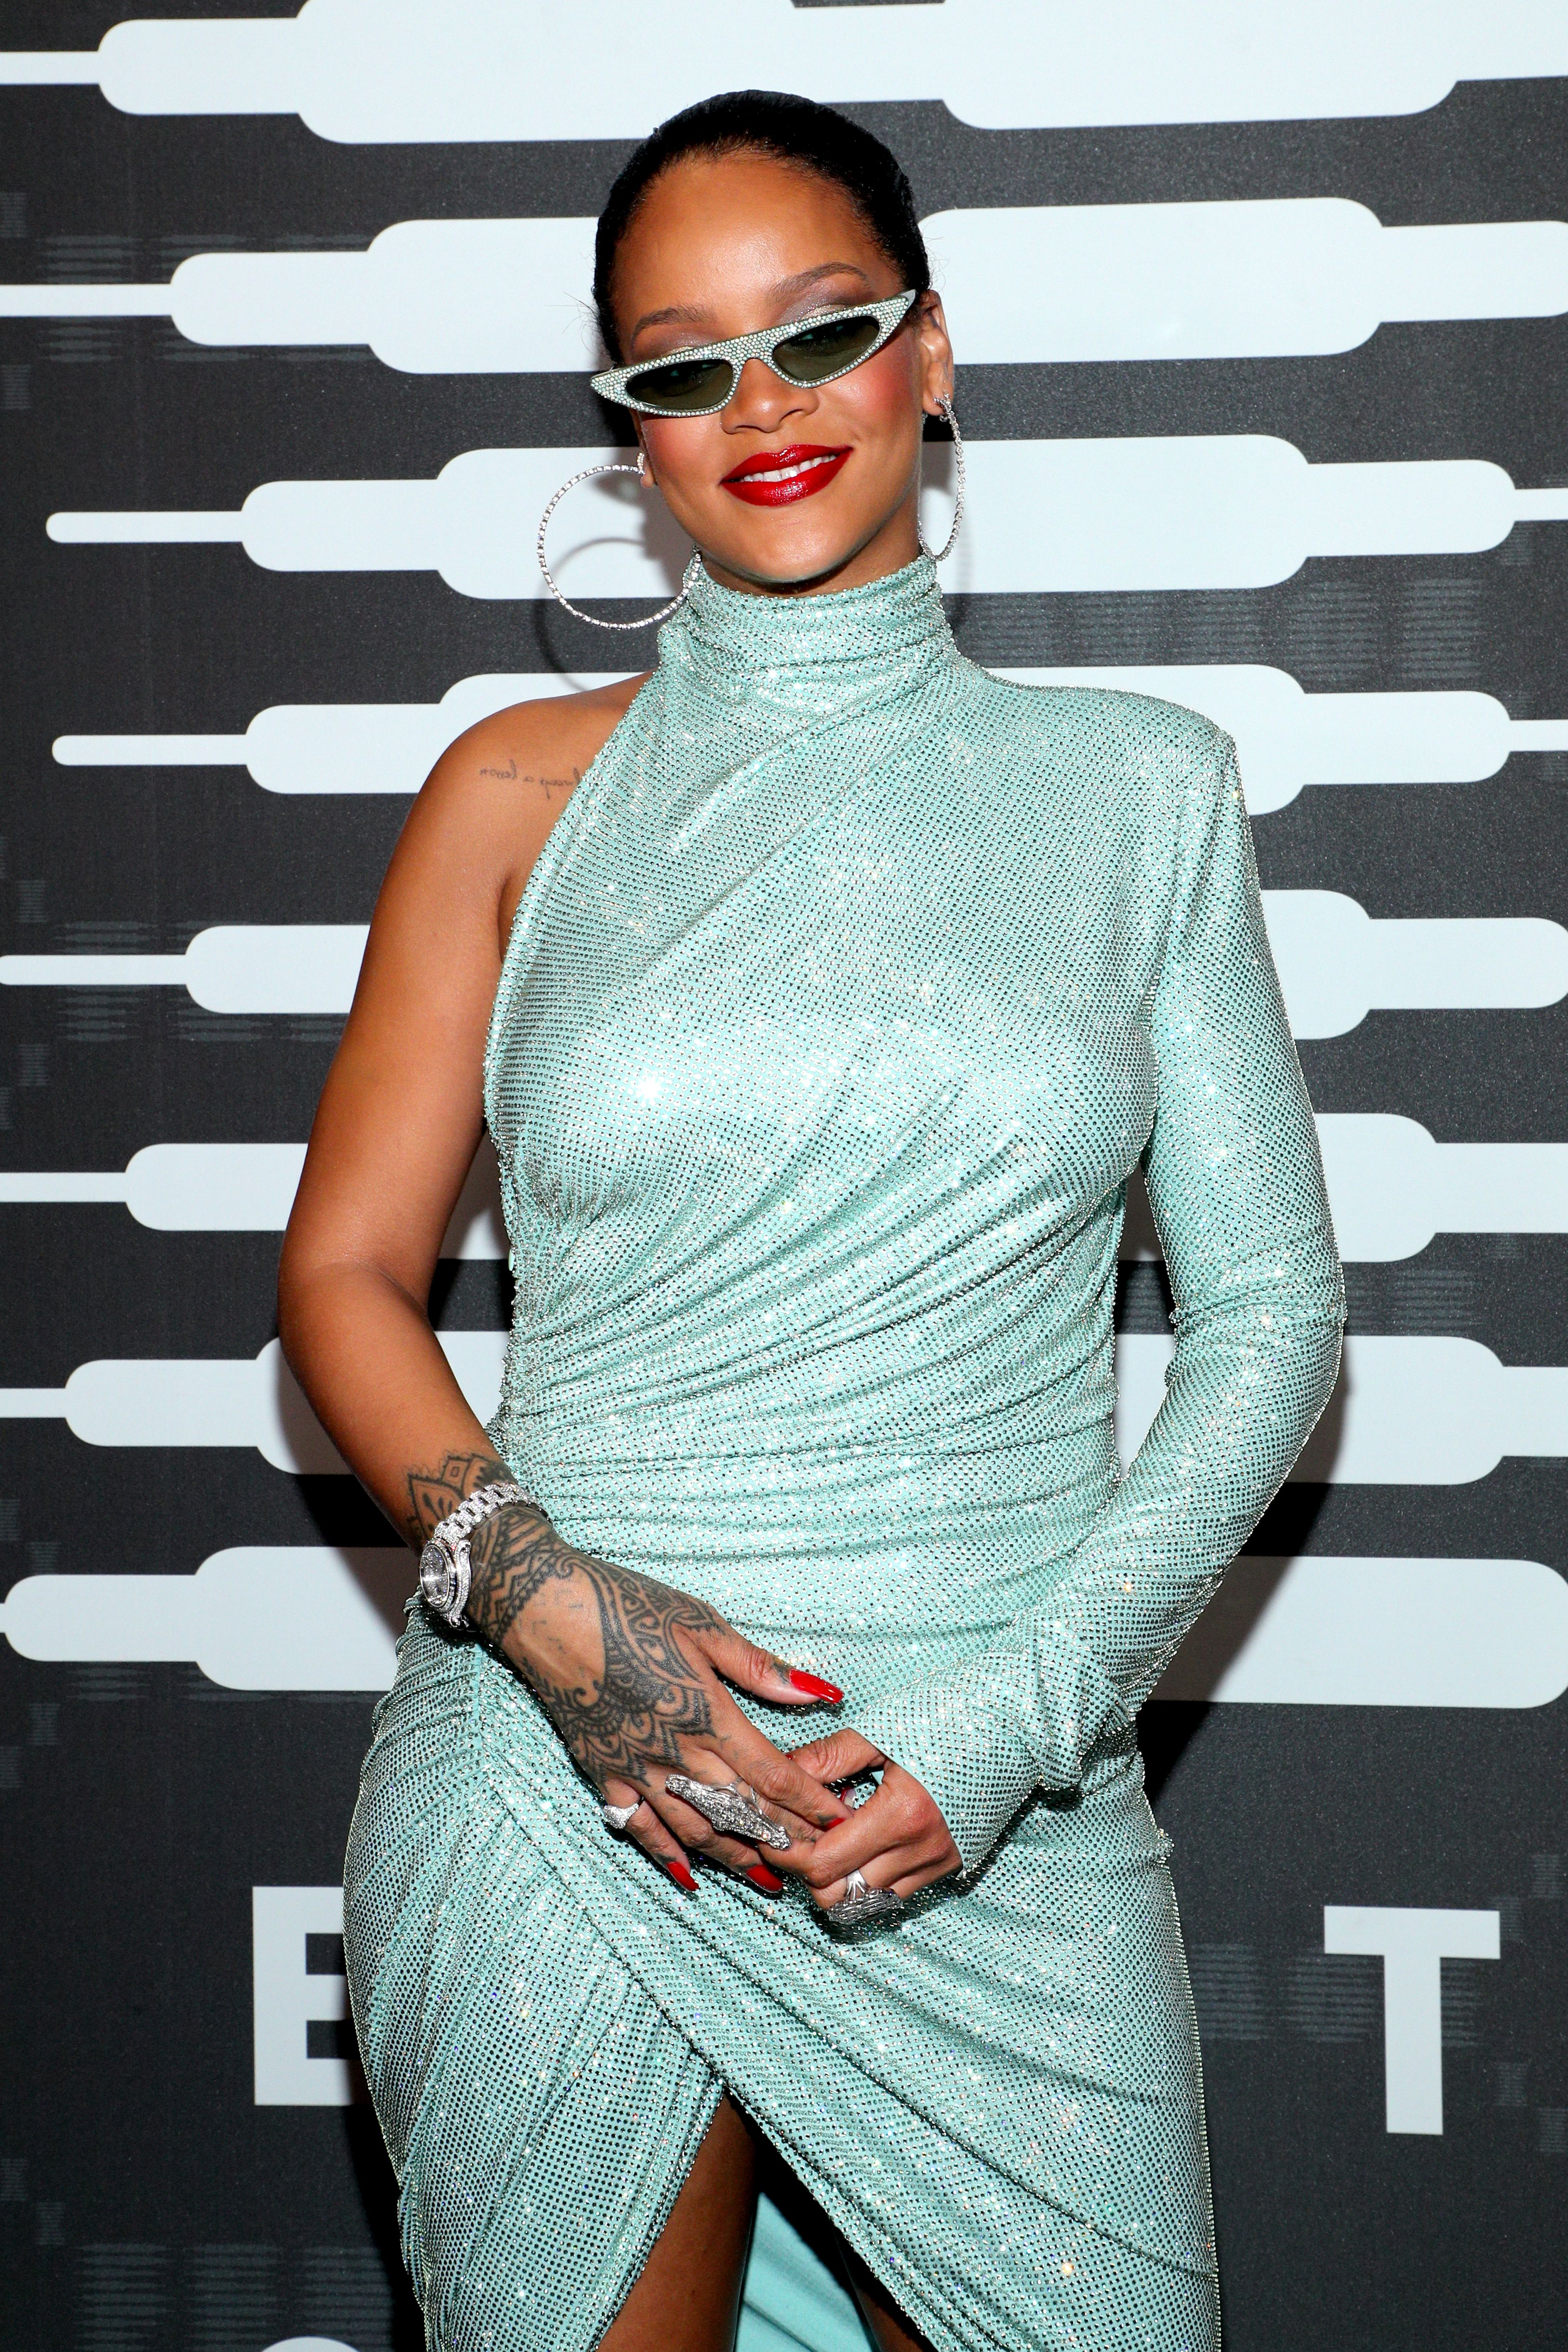 RihannaSavage x Fenty show, Arrivals, Spring Summer 2020, New York Fashion Week, USA - 10 Sep 2019